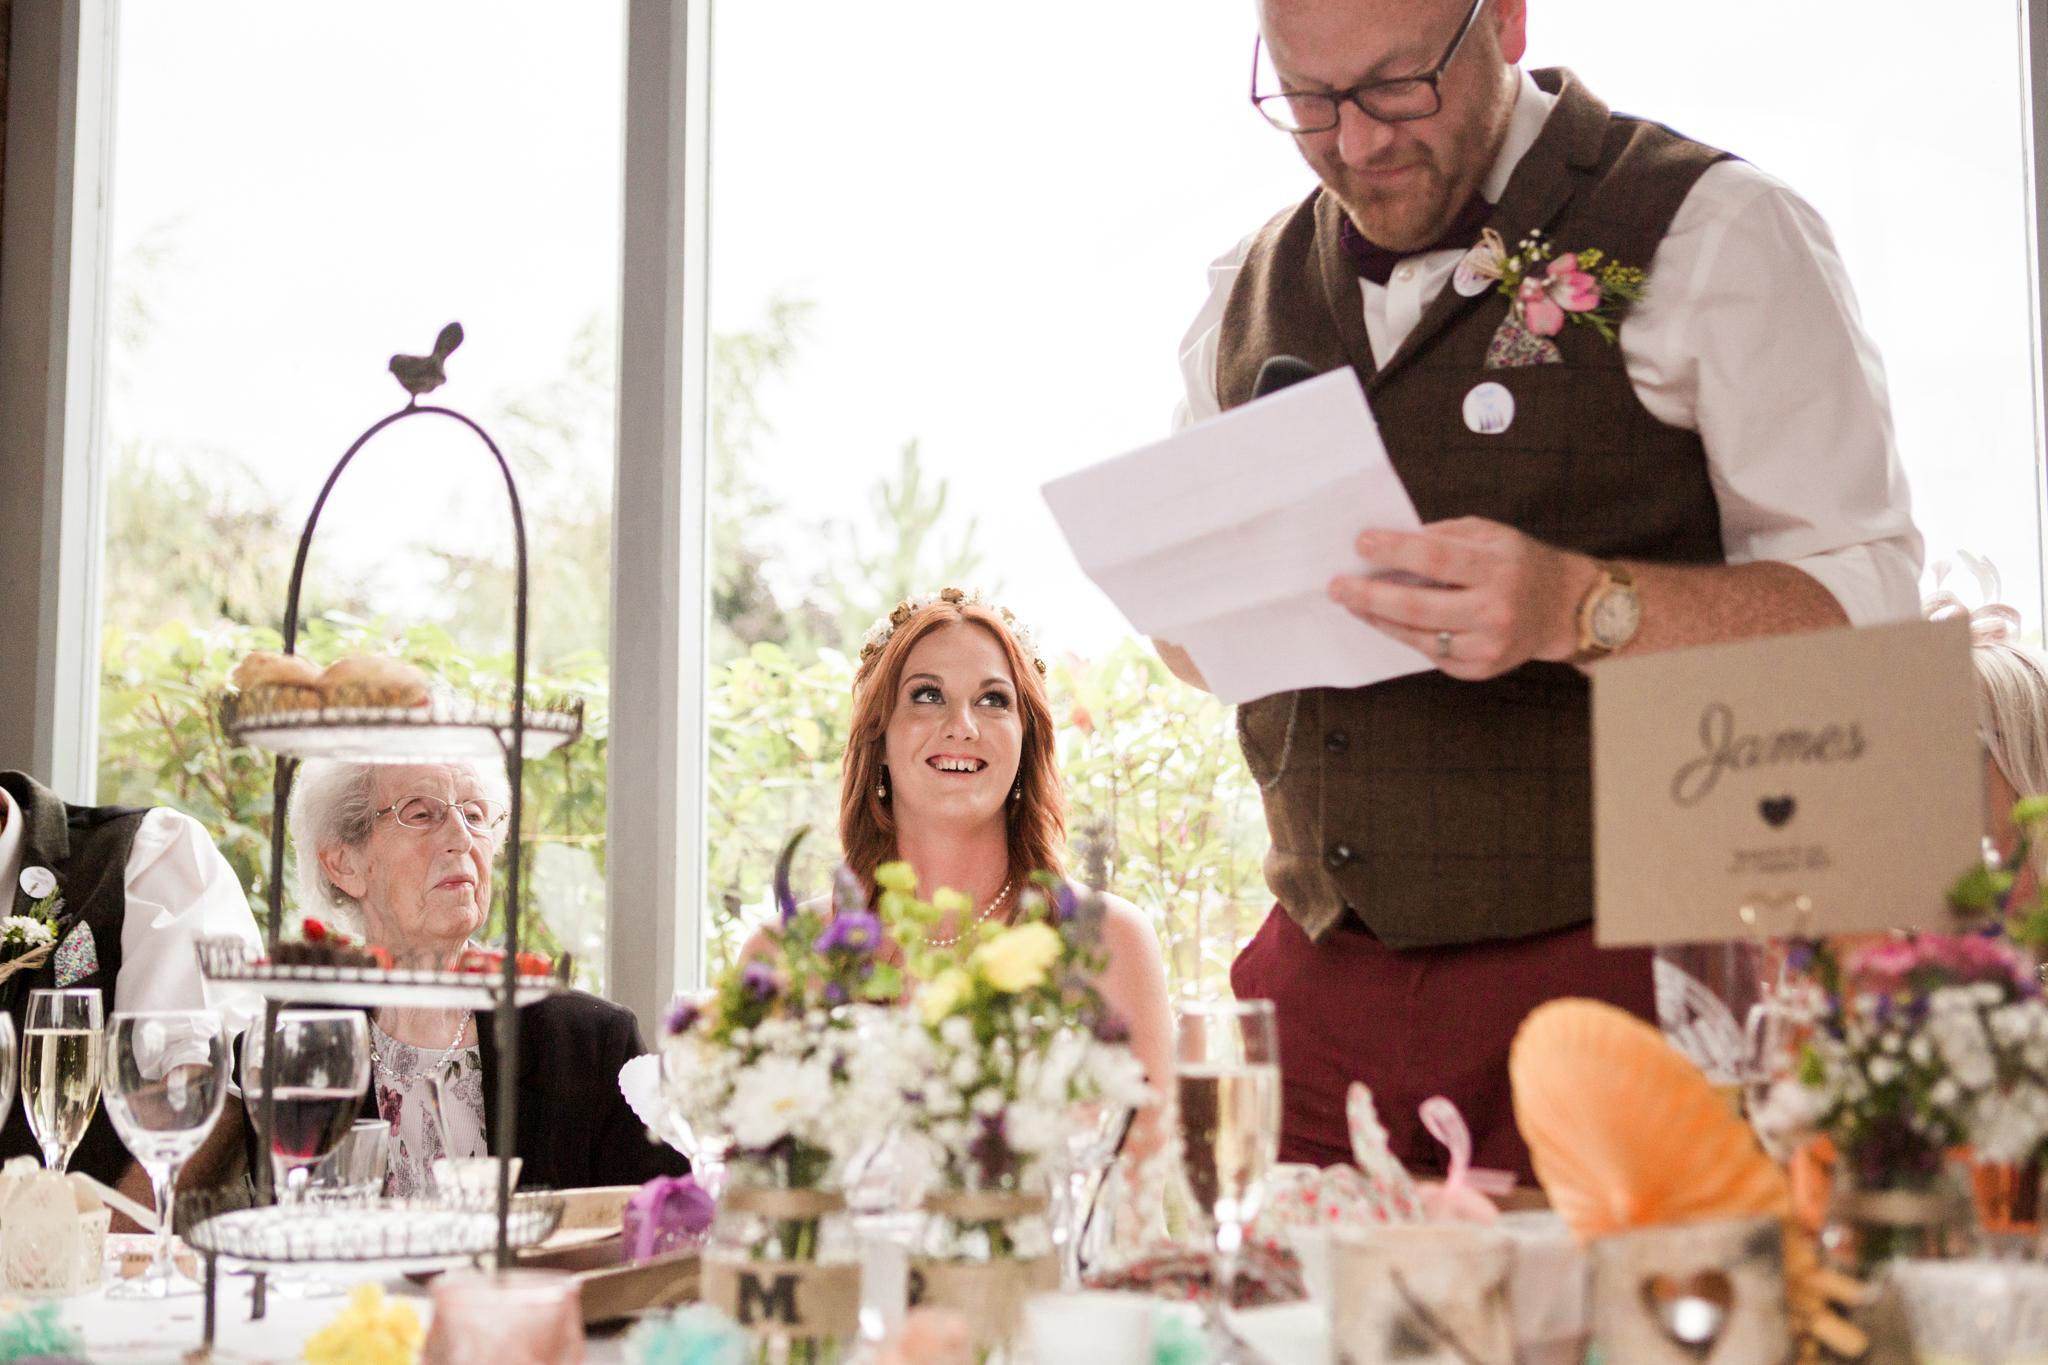 Rowsie & Lee, Swallows Nest Barn Wedding, Cotswold wedding photographer, Warwickshire Wedding Photographer-133.jpg